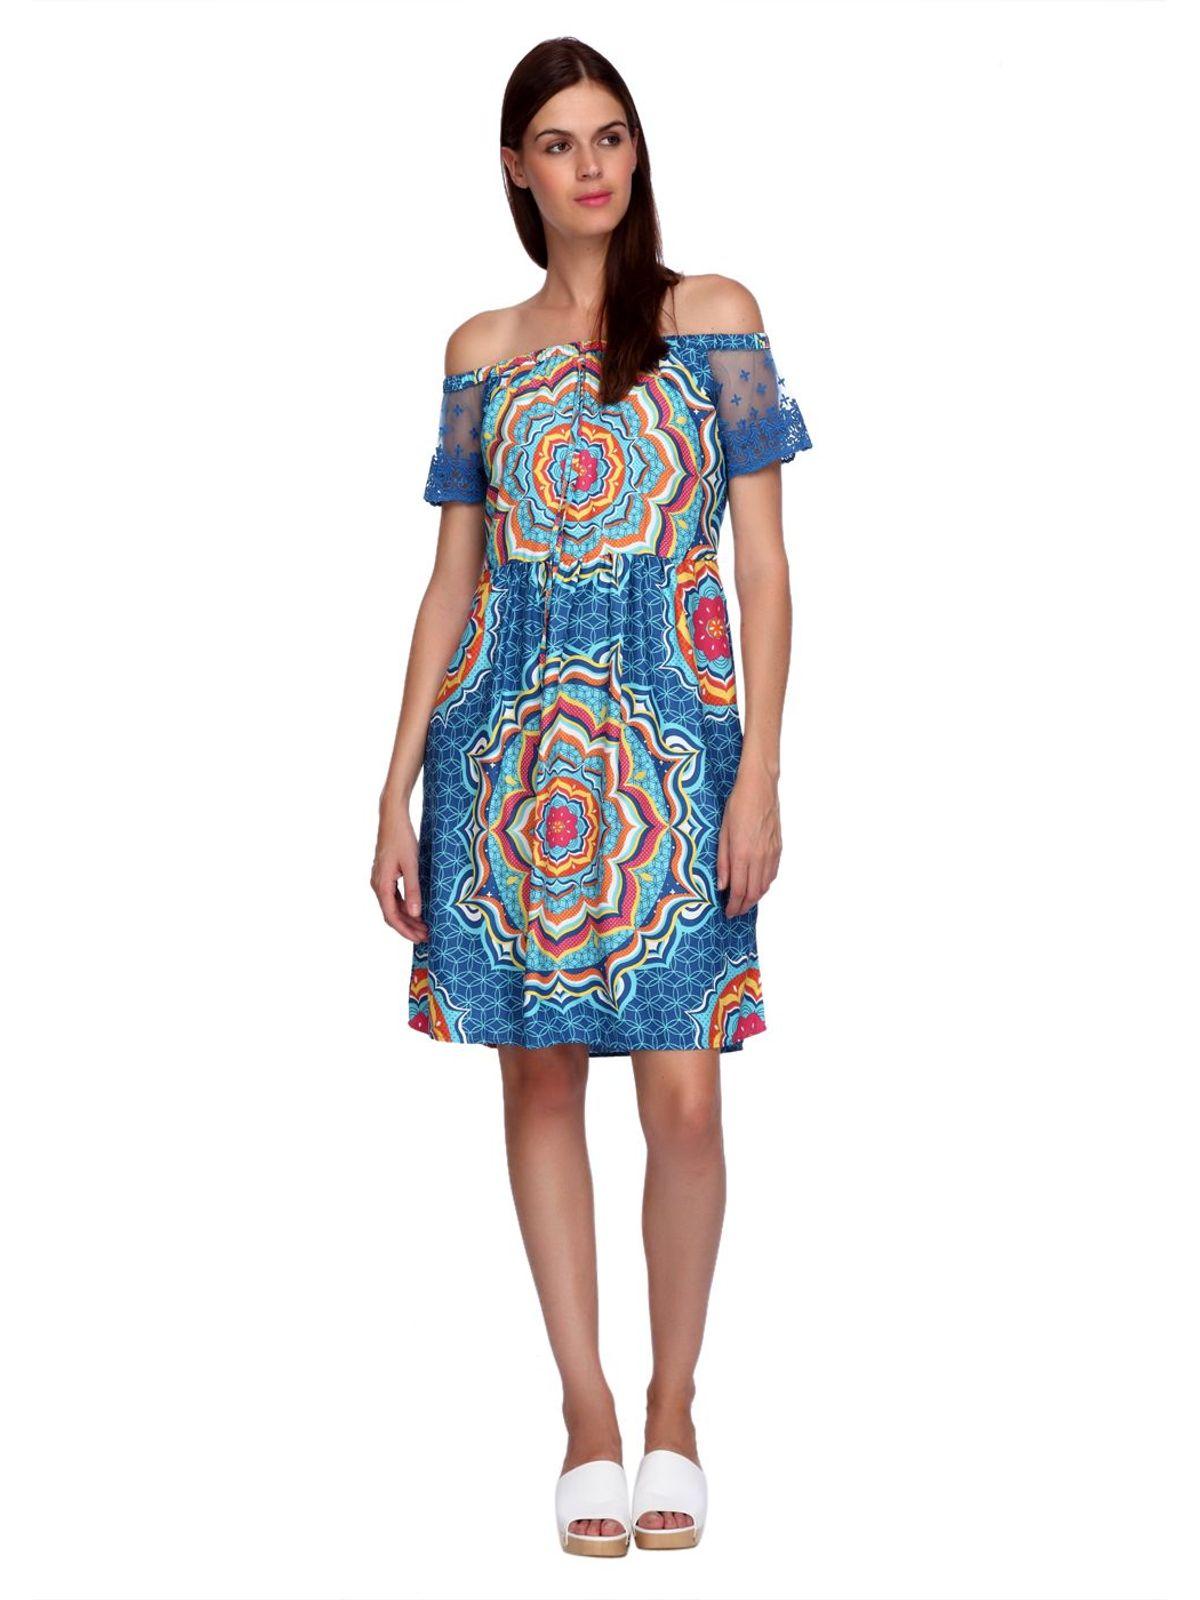 MANDALA OFF SHOULDER DRESS